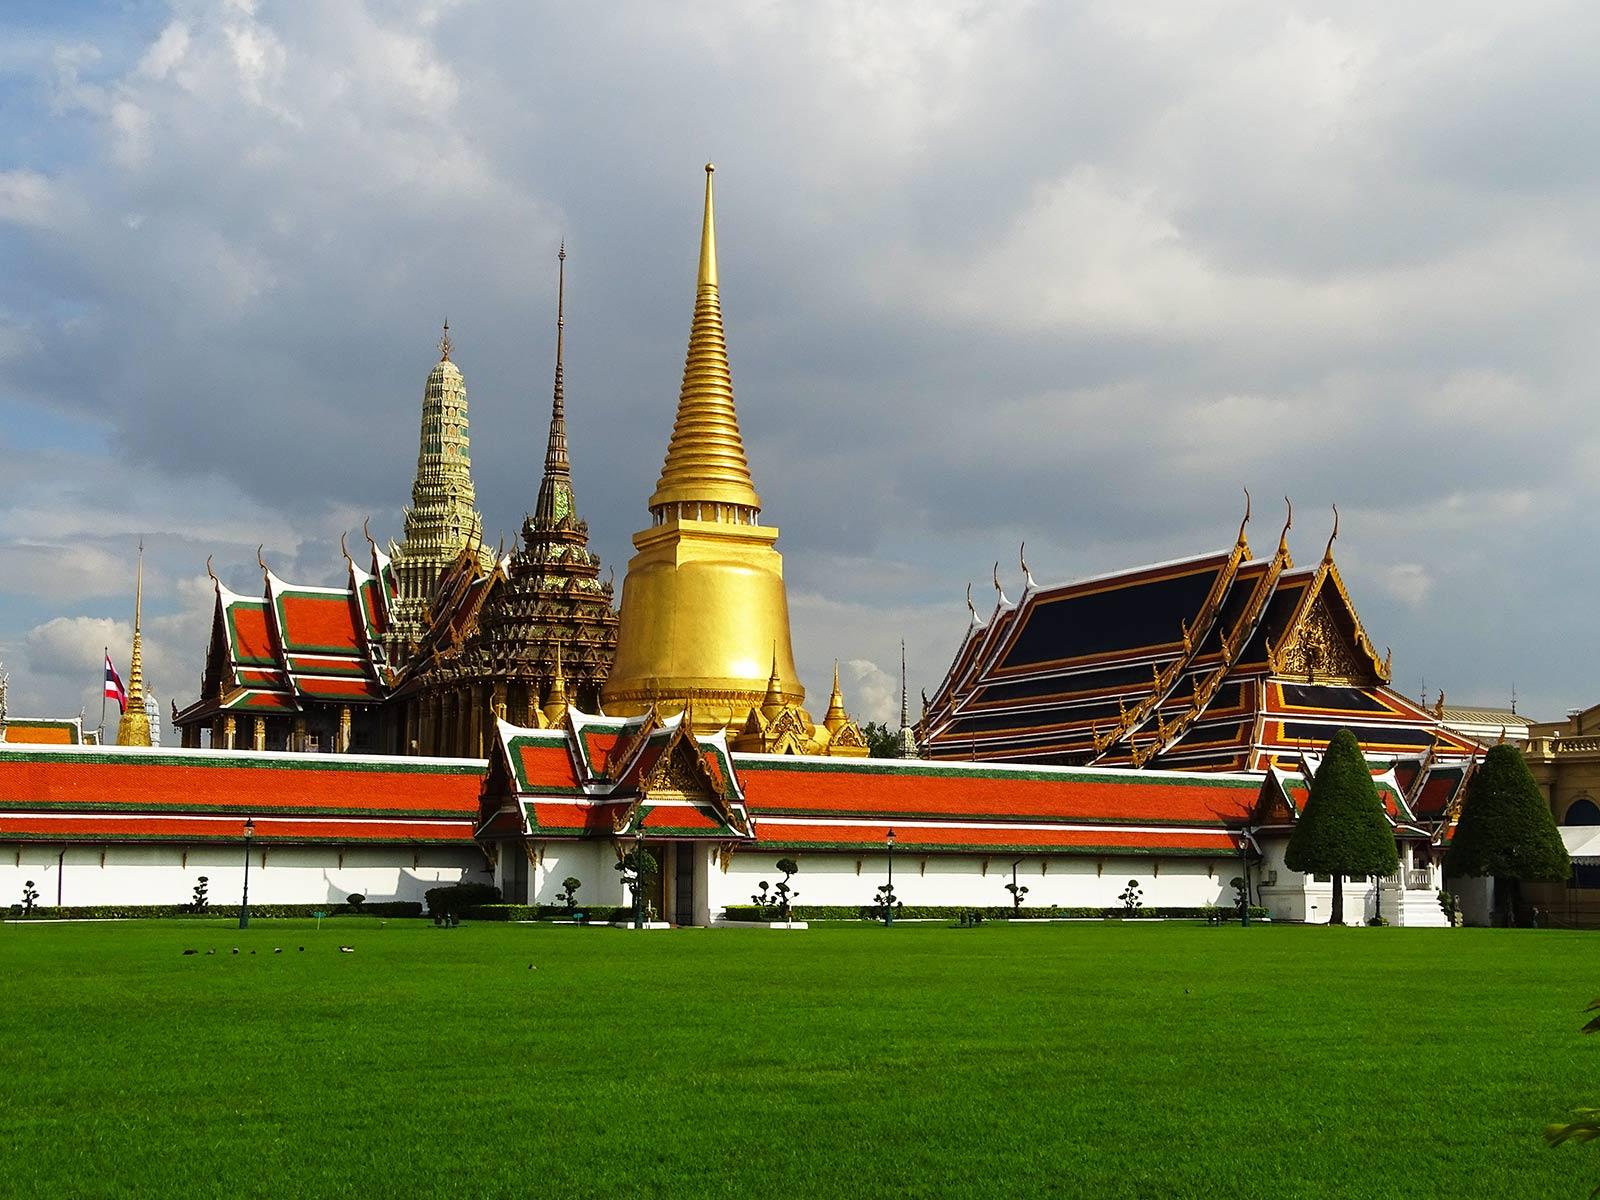 rondreis thailand bangkok hoogtepunt 5